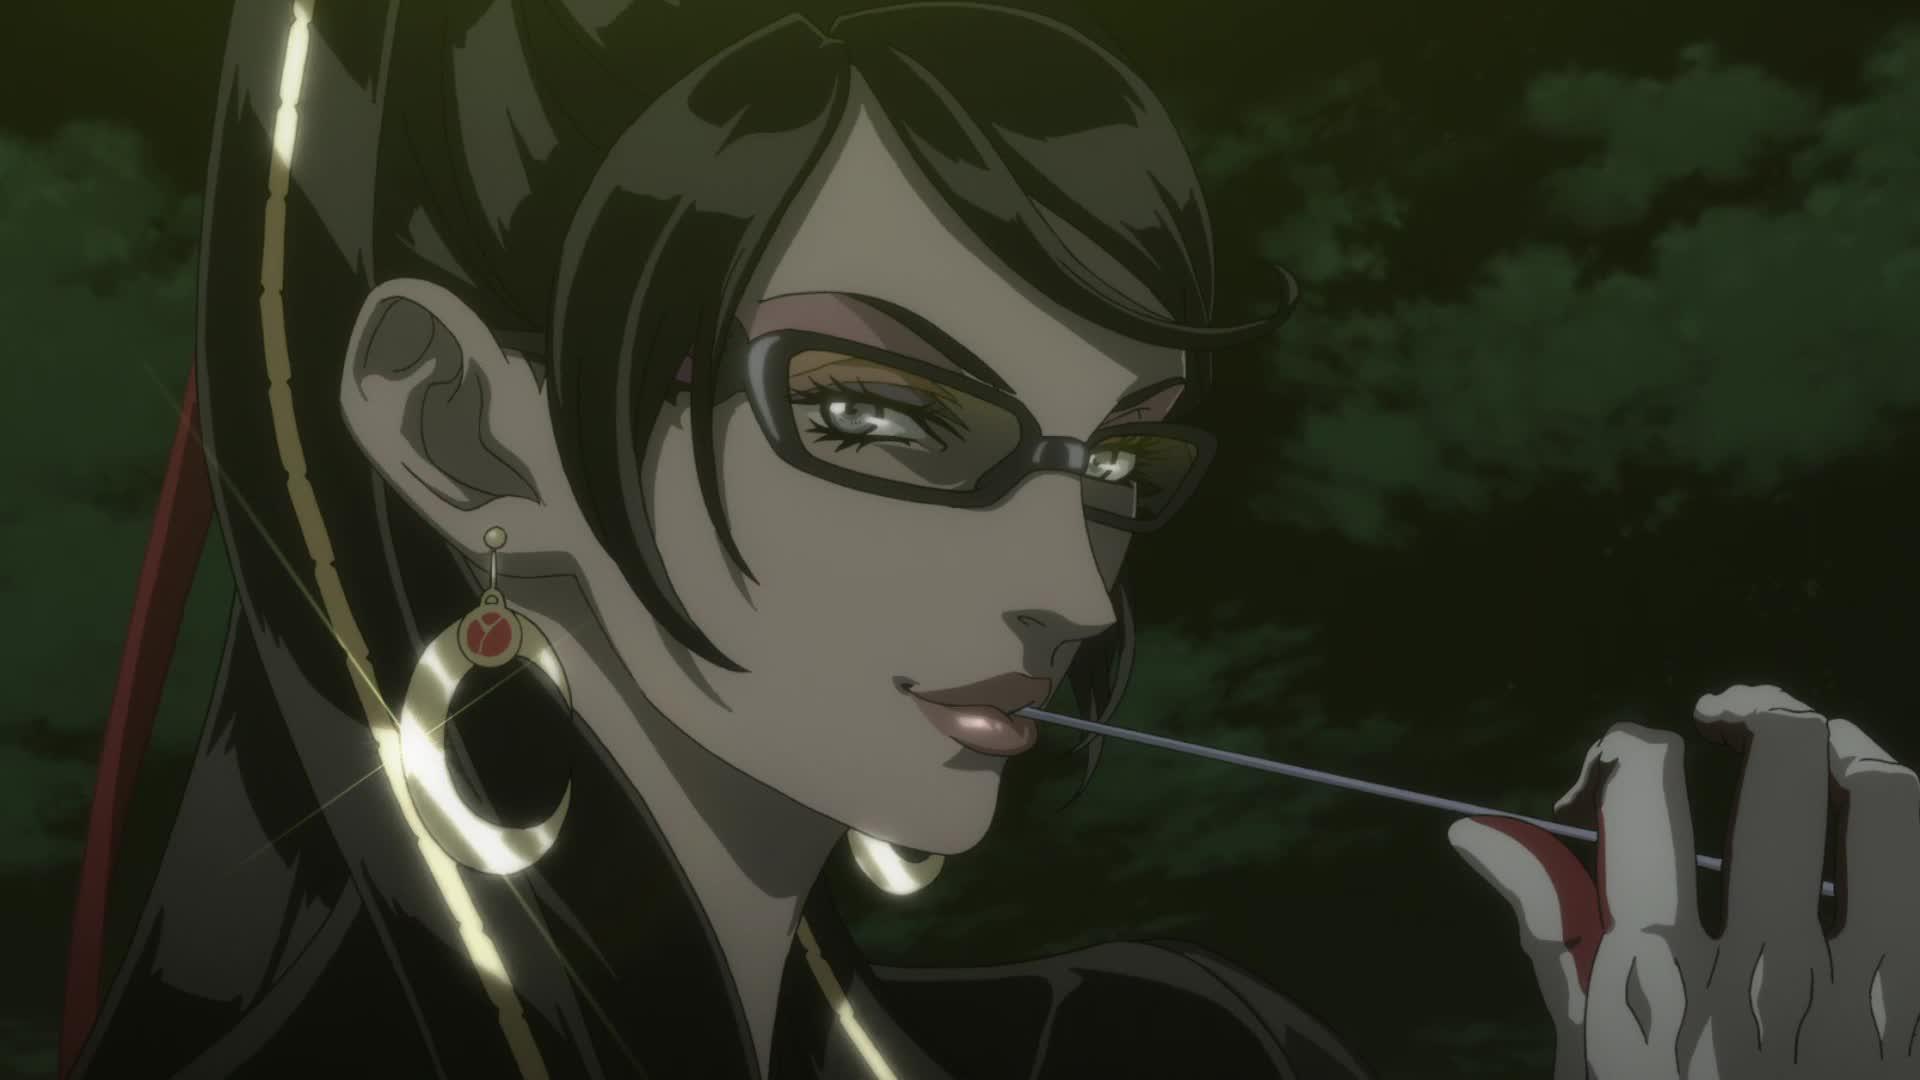 Bayonetta-anime.jpg